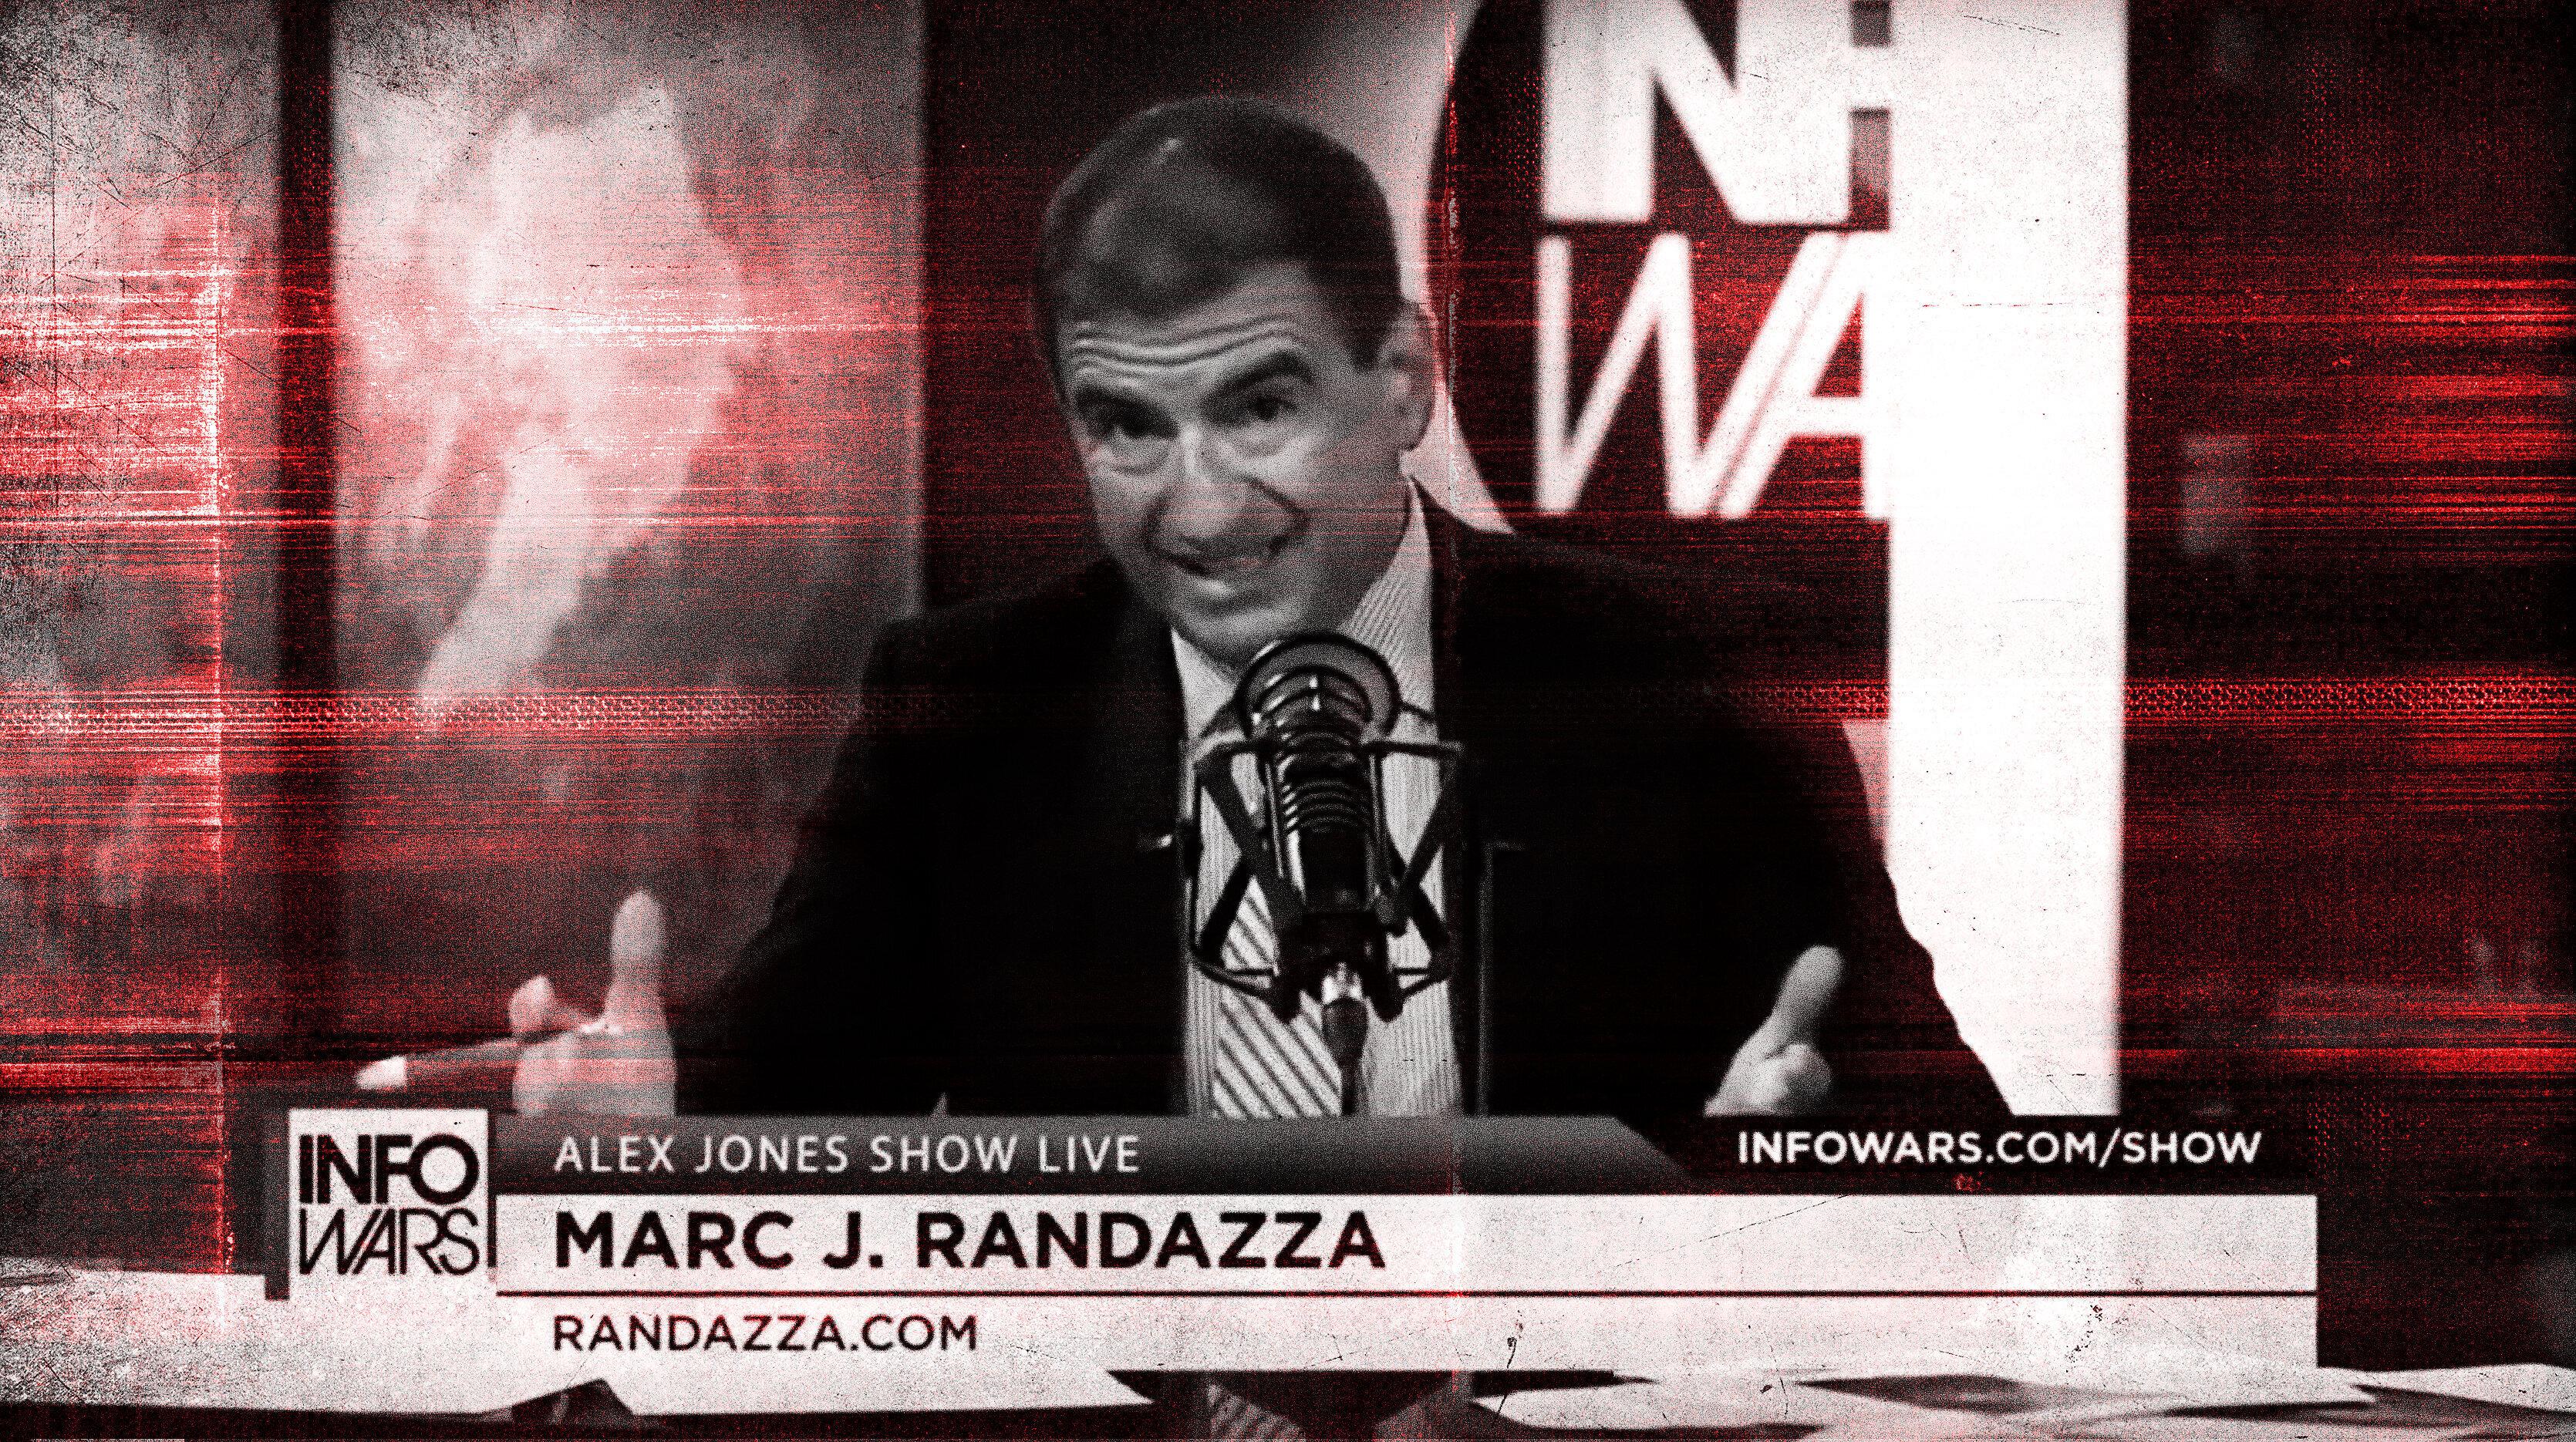 Randazza appears regularly on far-right conspiracy theorist Alex Jones' InfoWars.